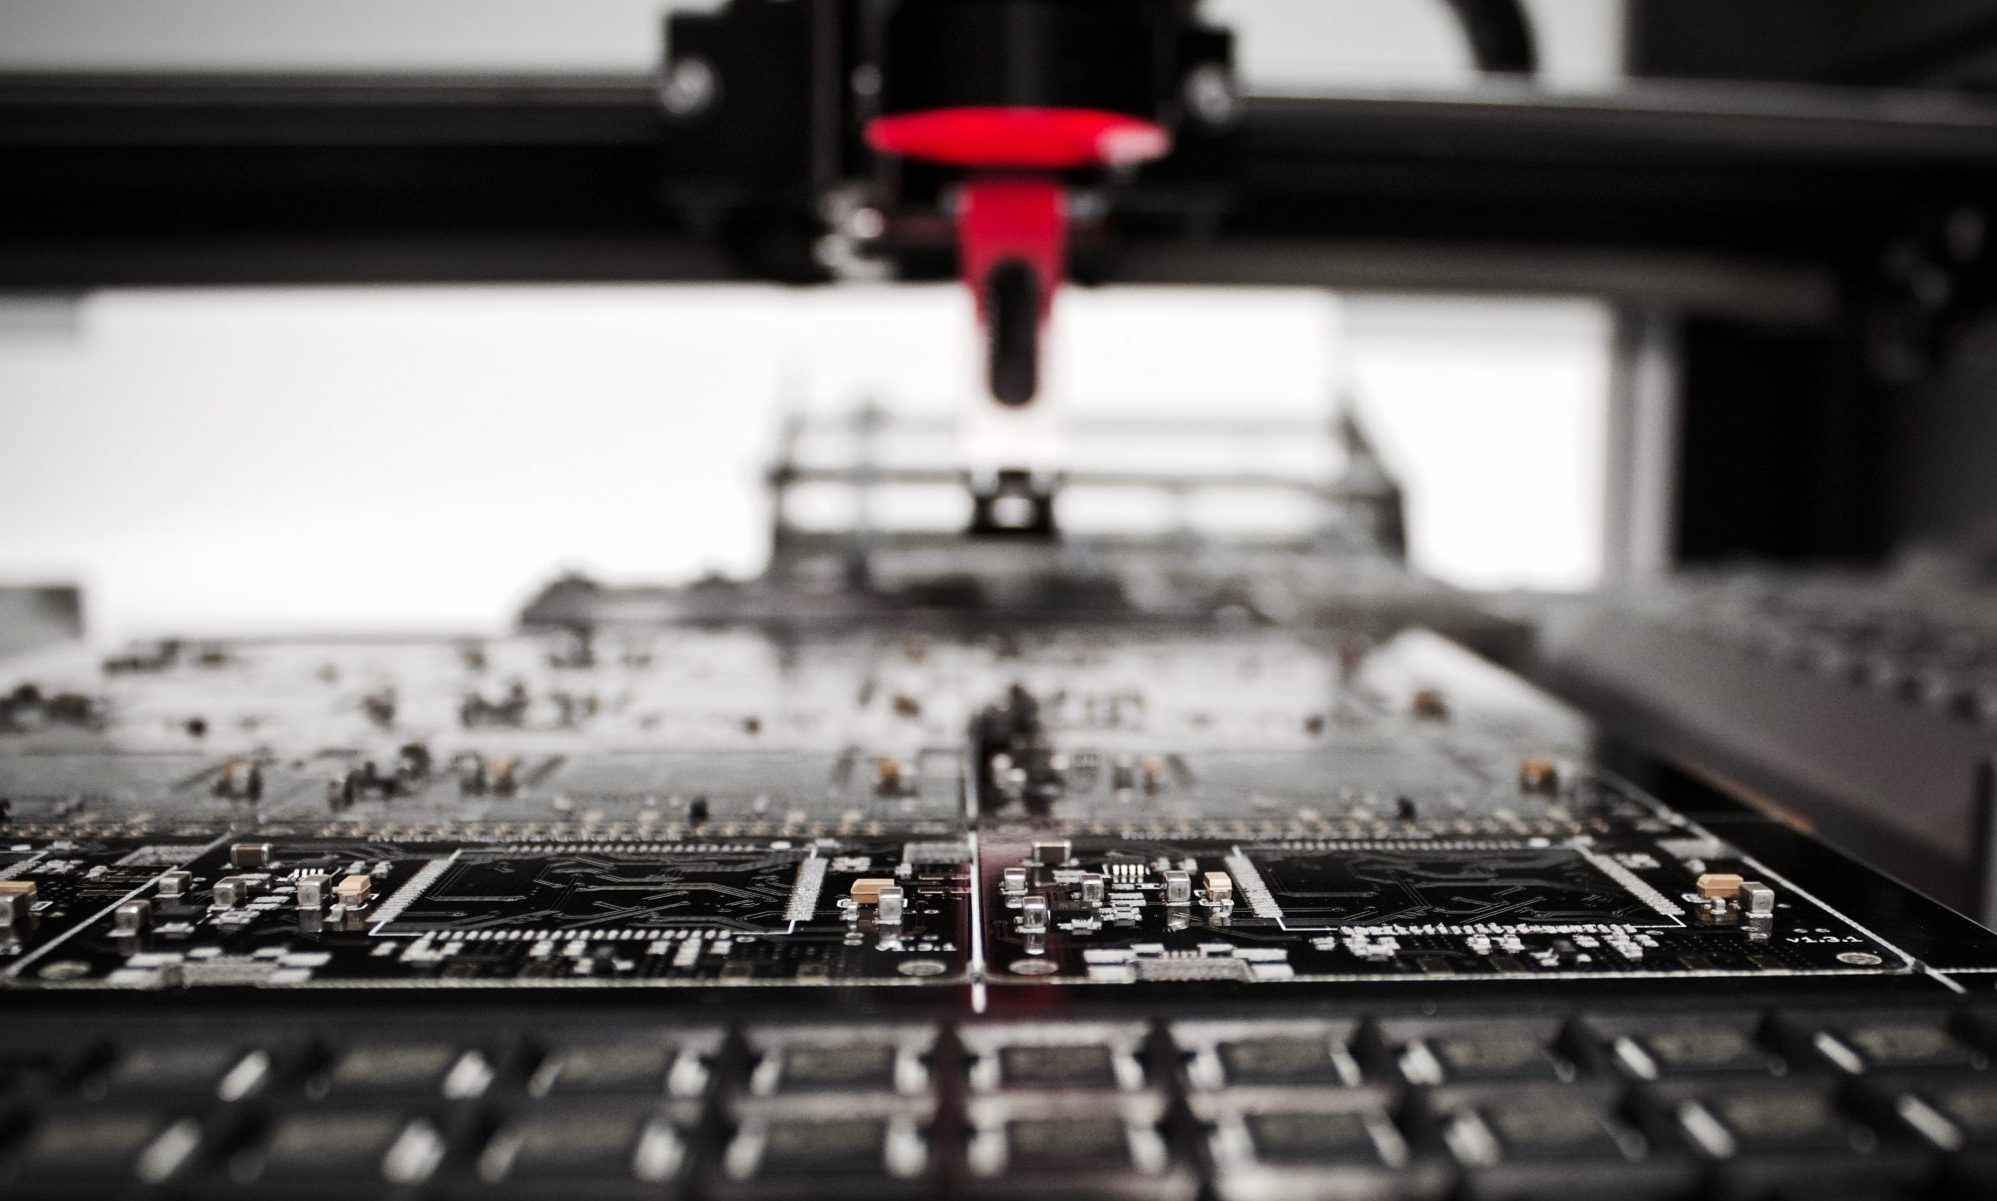 Hardware Startup Tools